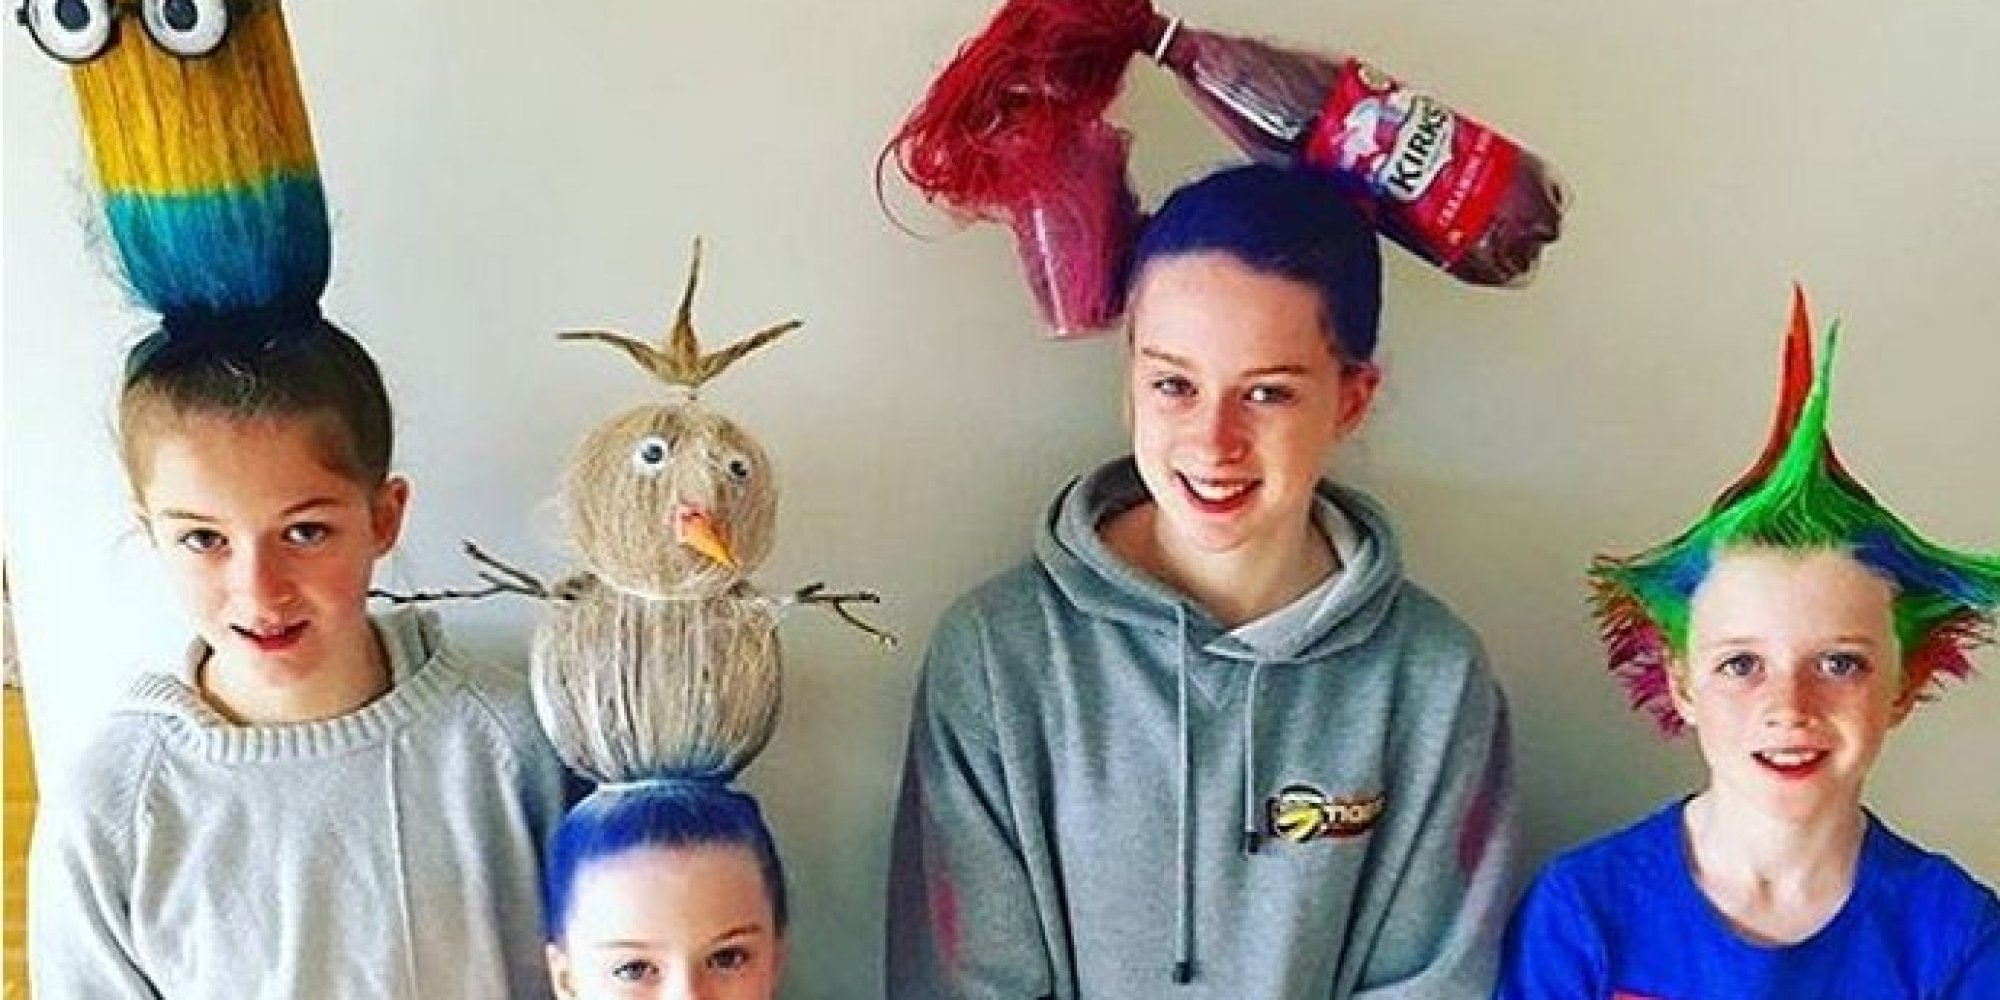 10 Famous Wacky Hair Day Ideas For School o crazy hair day ideas facebook scoilmhuiretullamoreblog